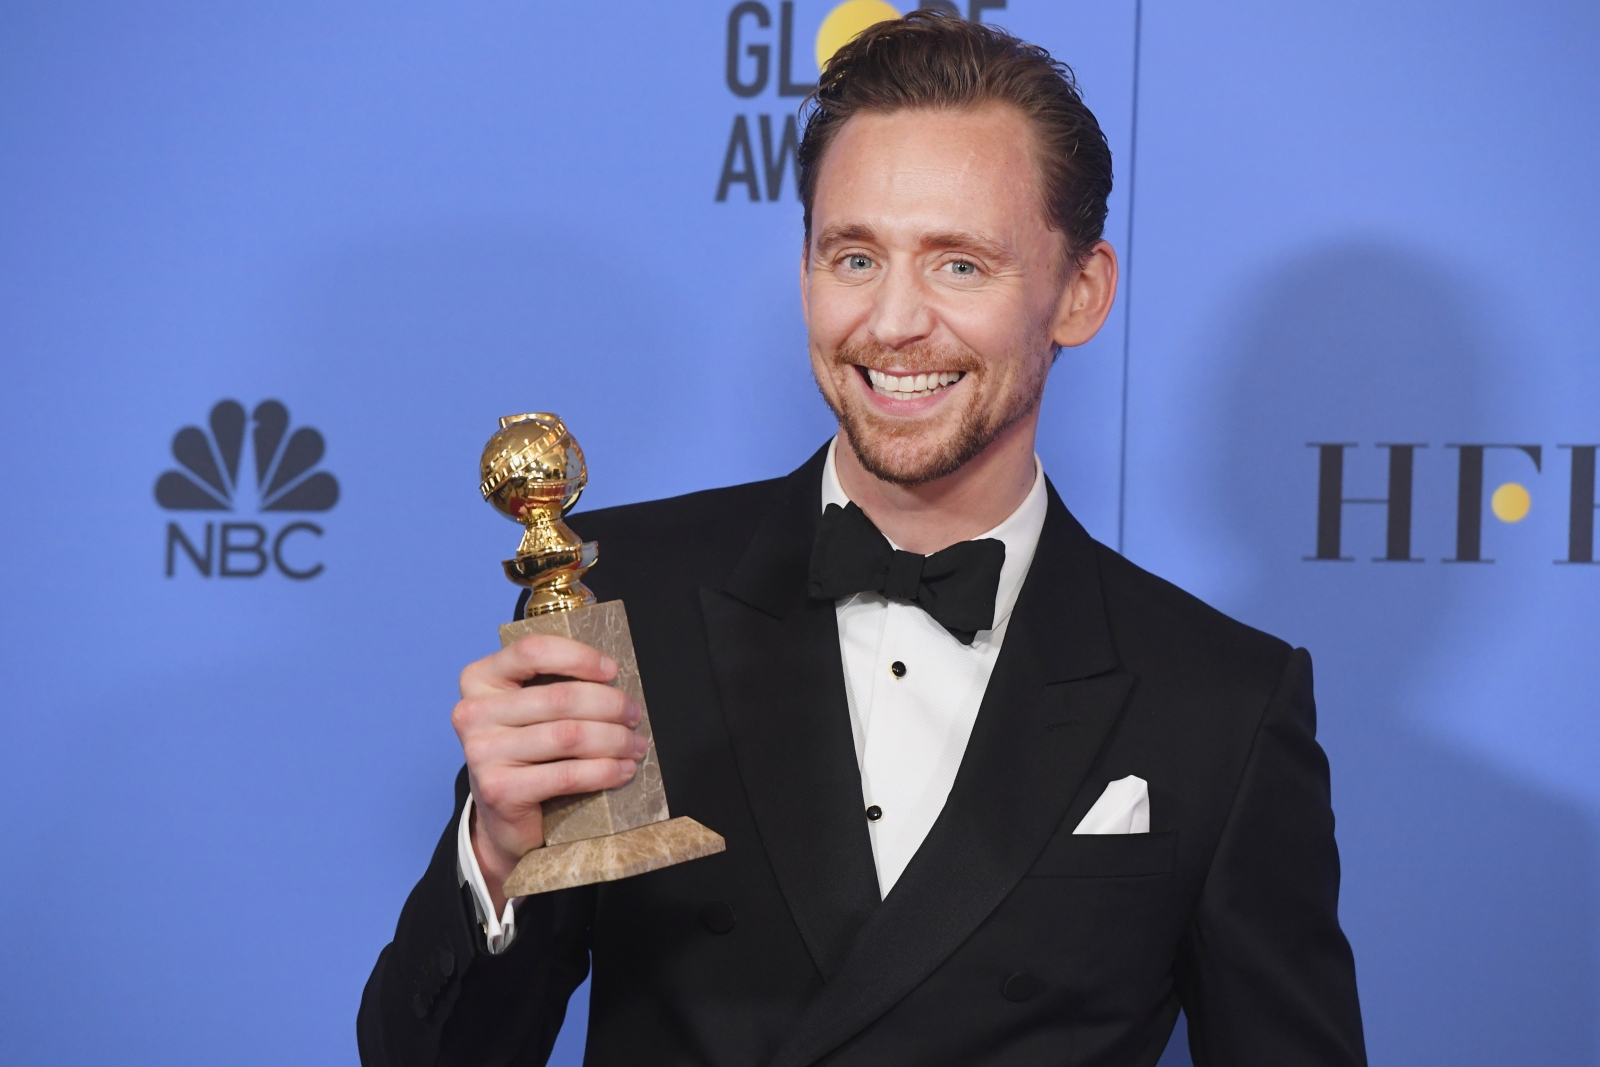 Tom Hiddleston at the Golden Globes 2017